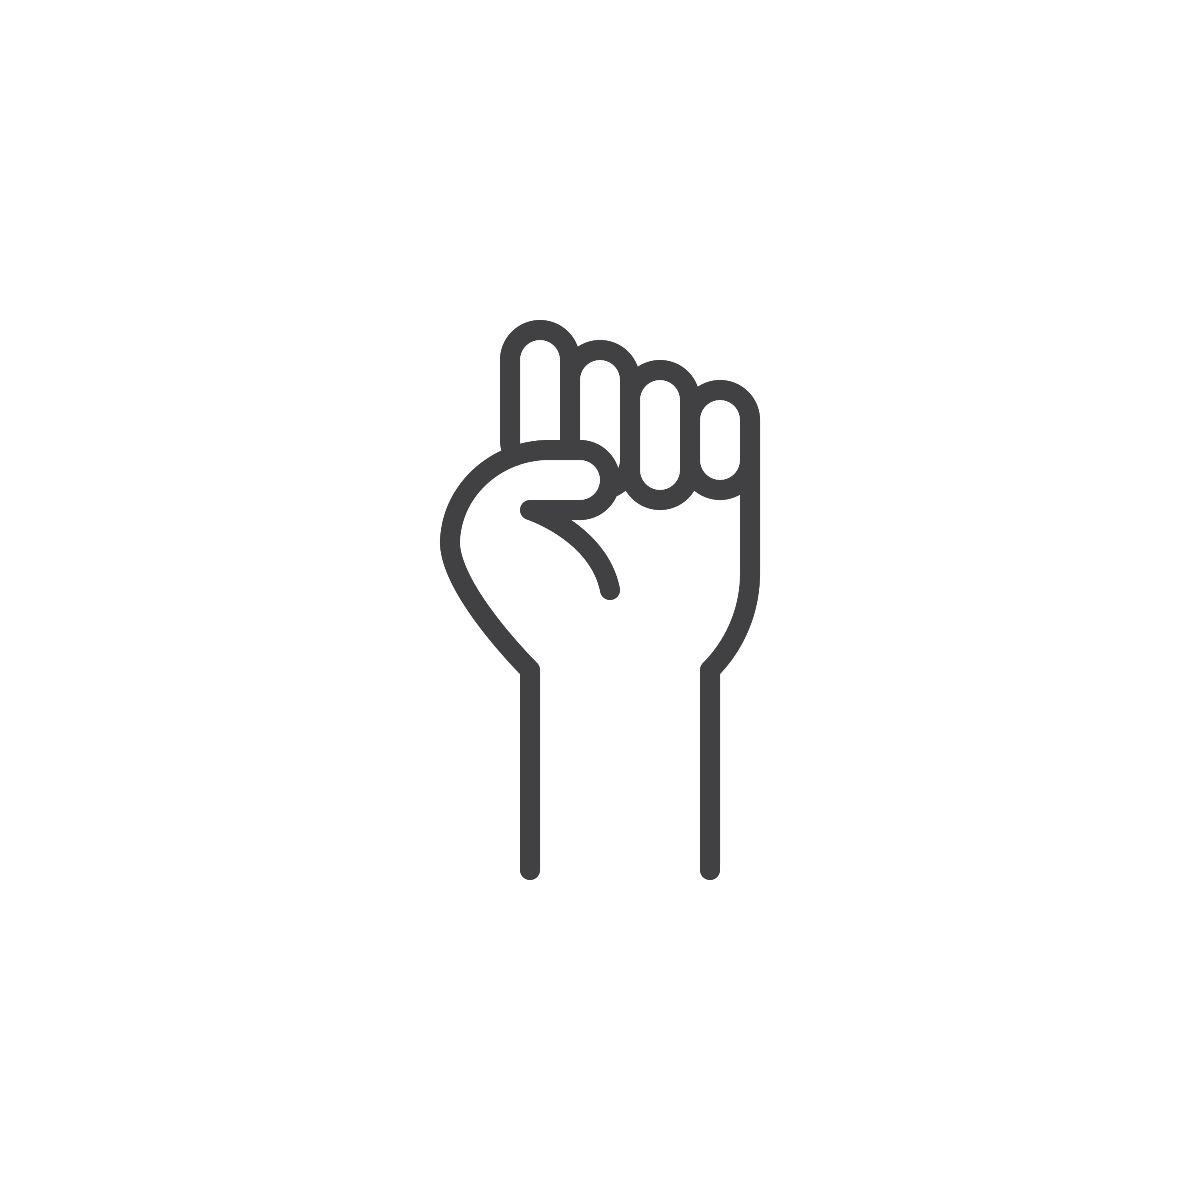 fist graphic